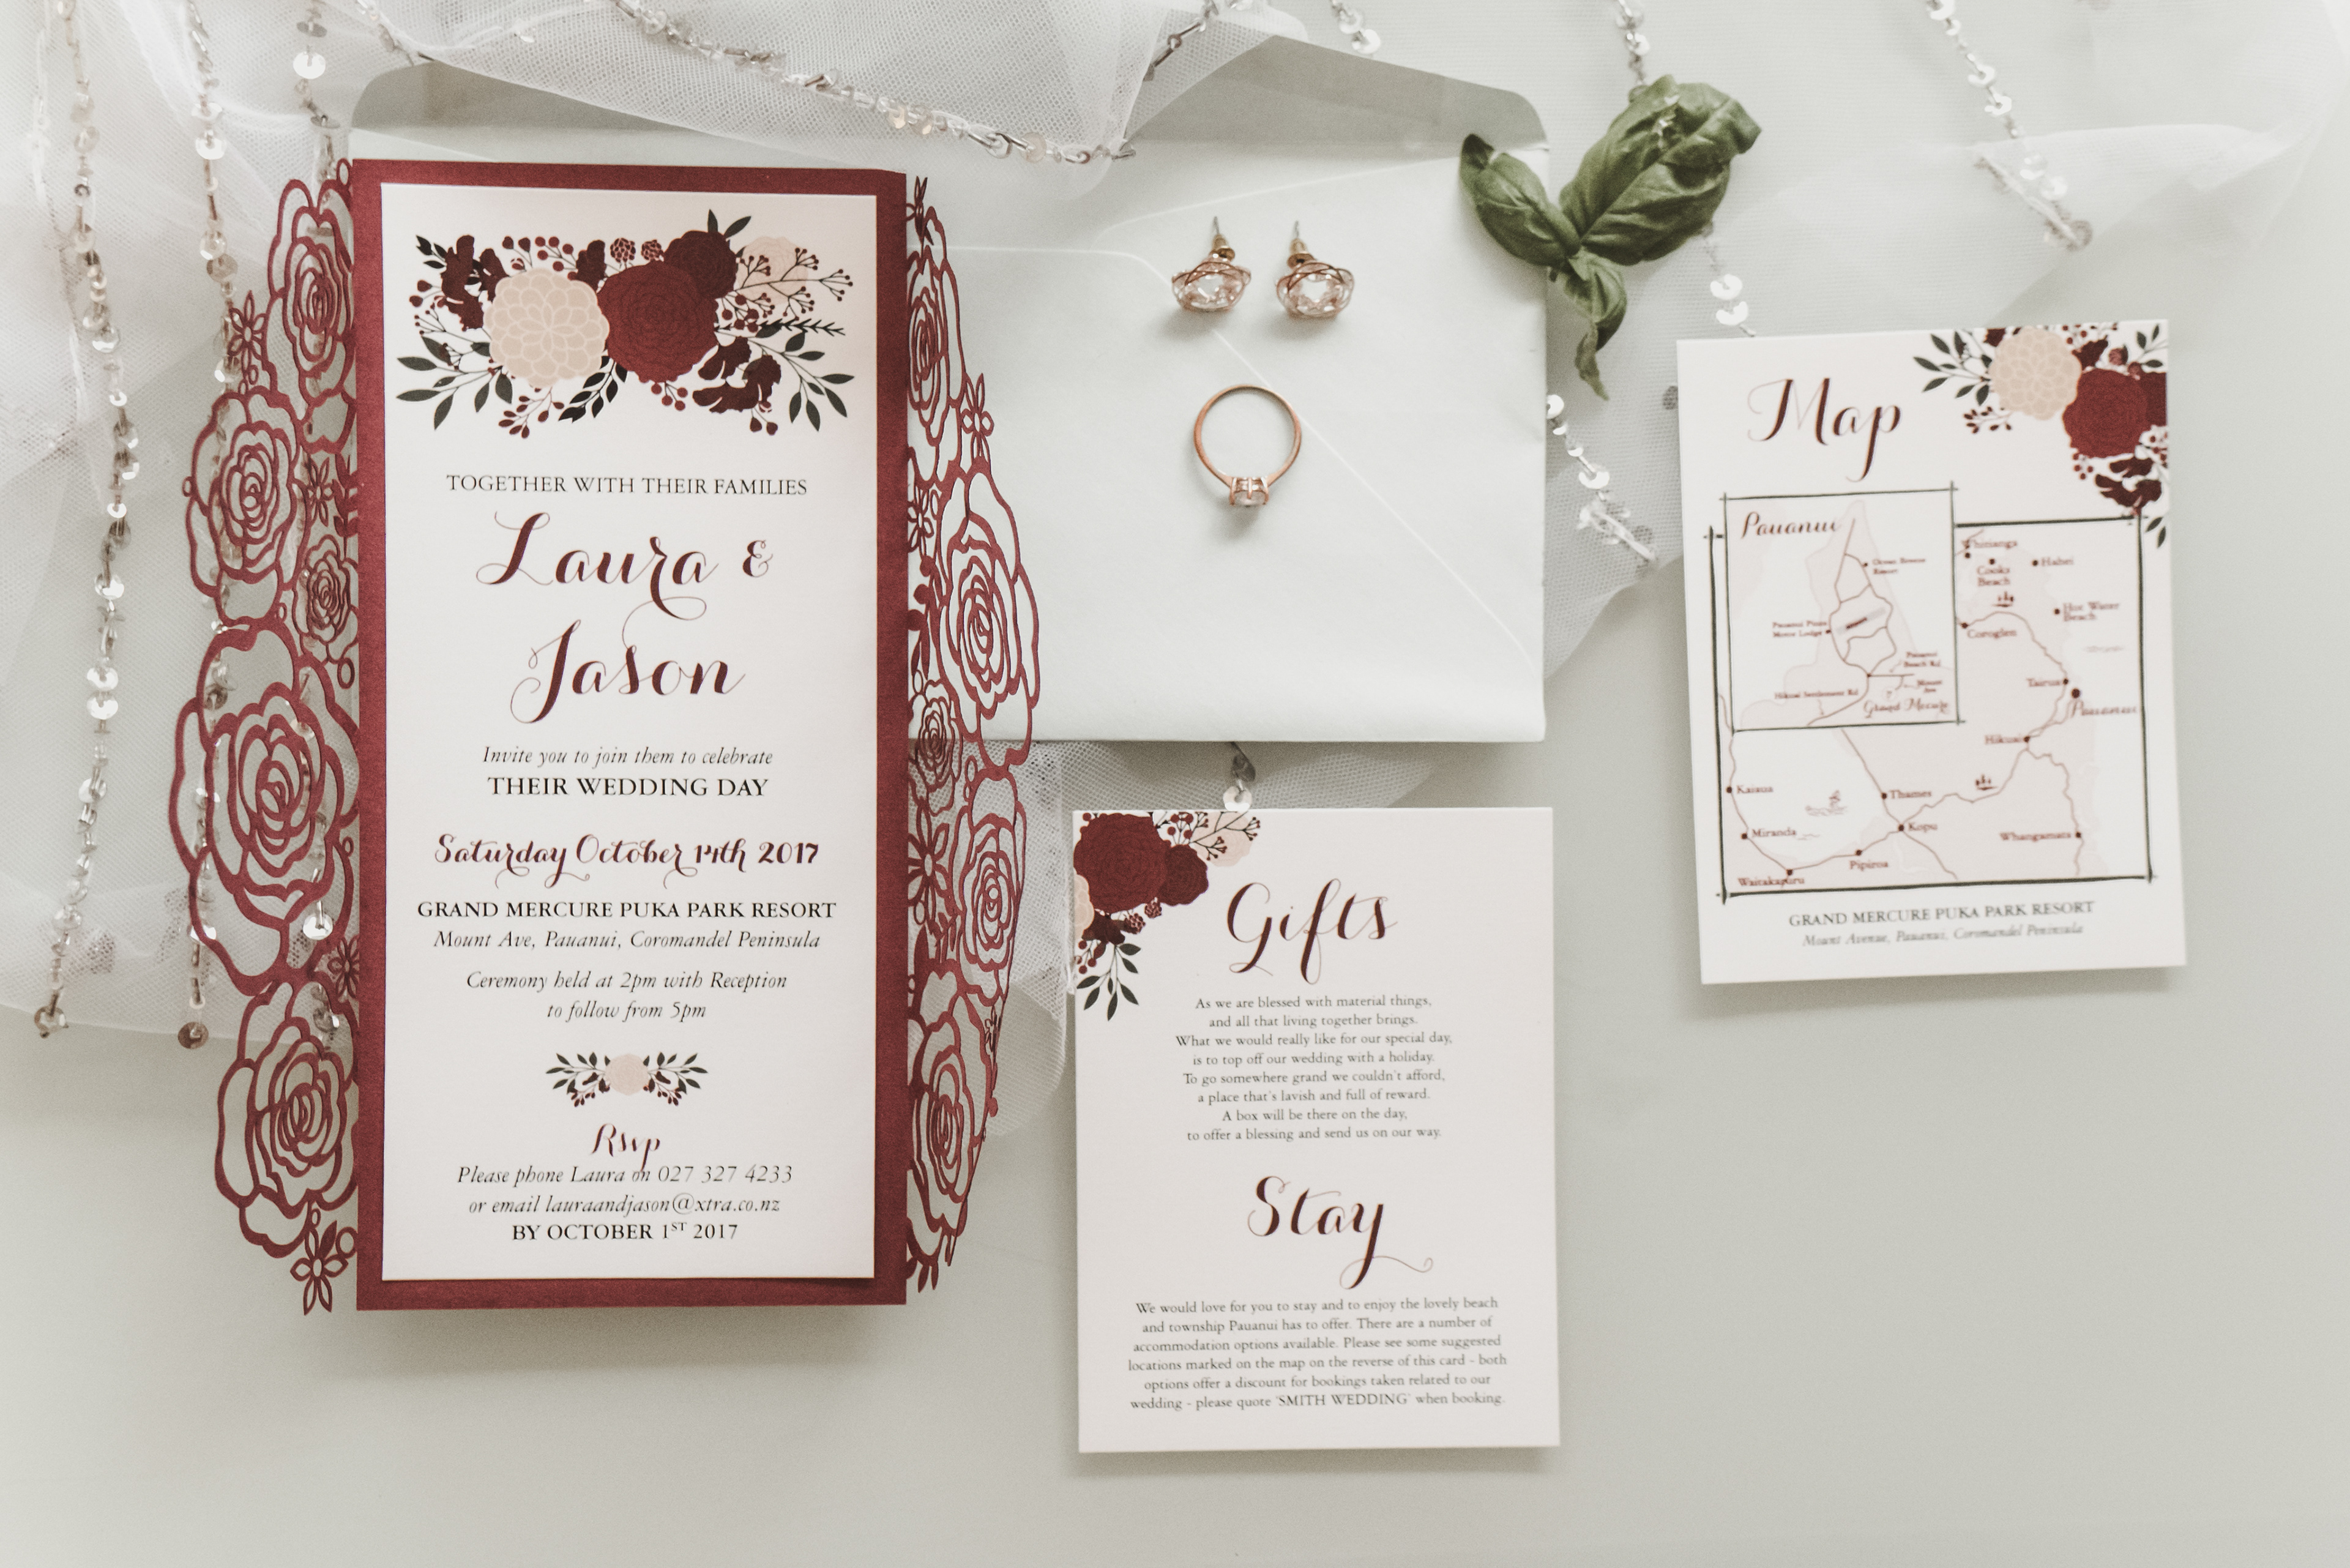 Alysha Johnson - WEDDING INVITATIONS AND STATIONERY